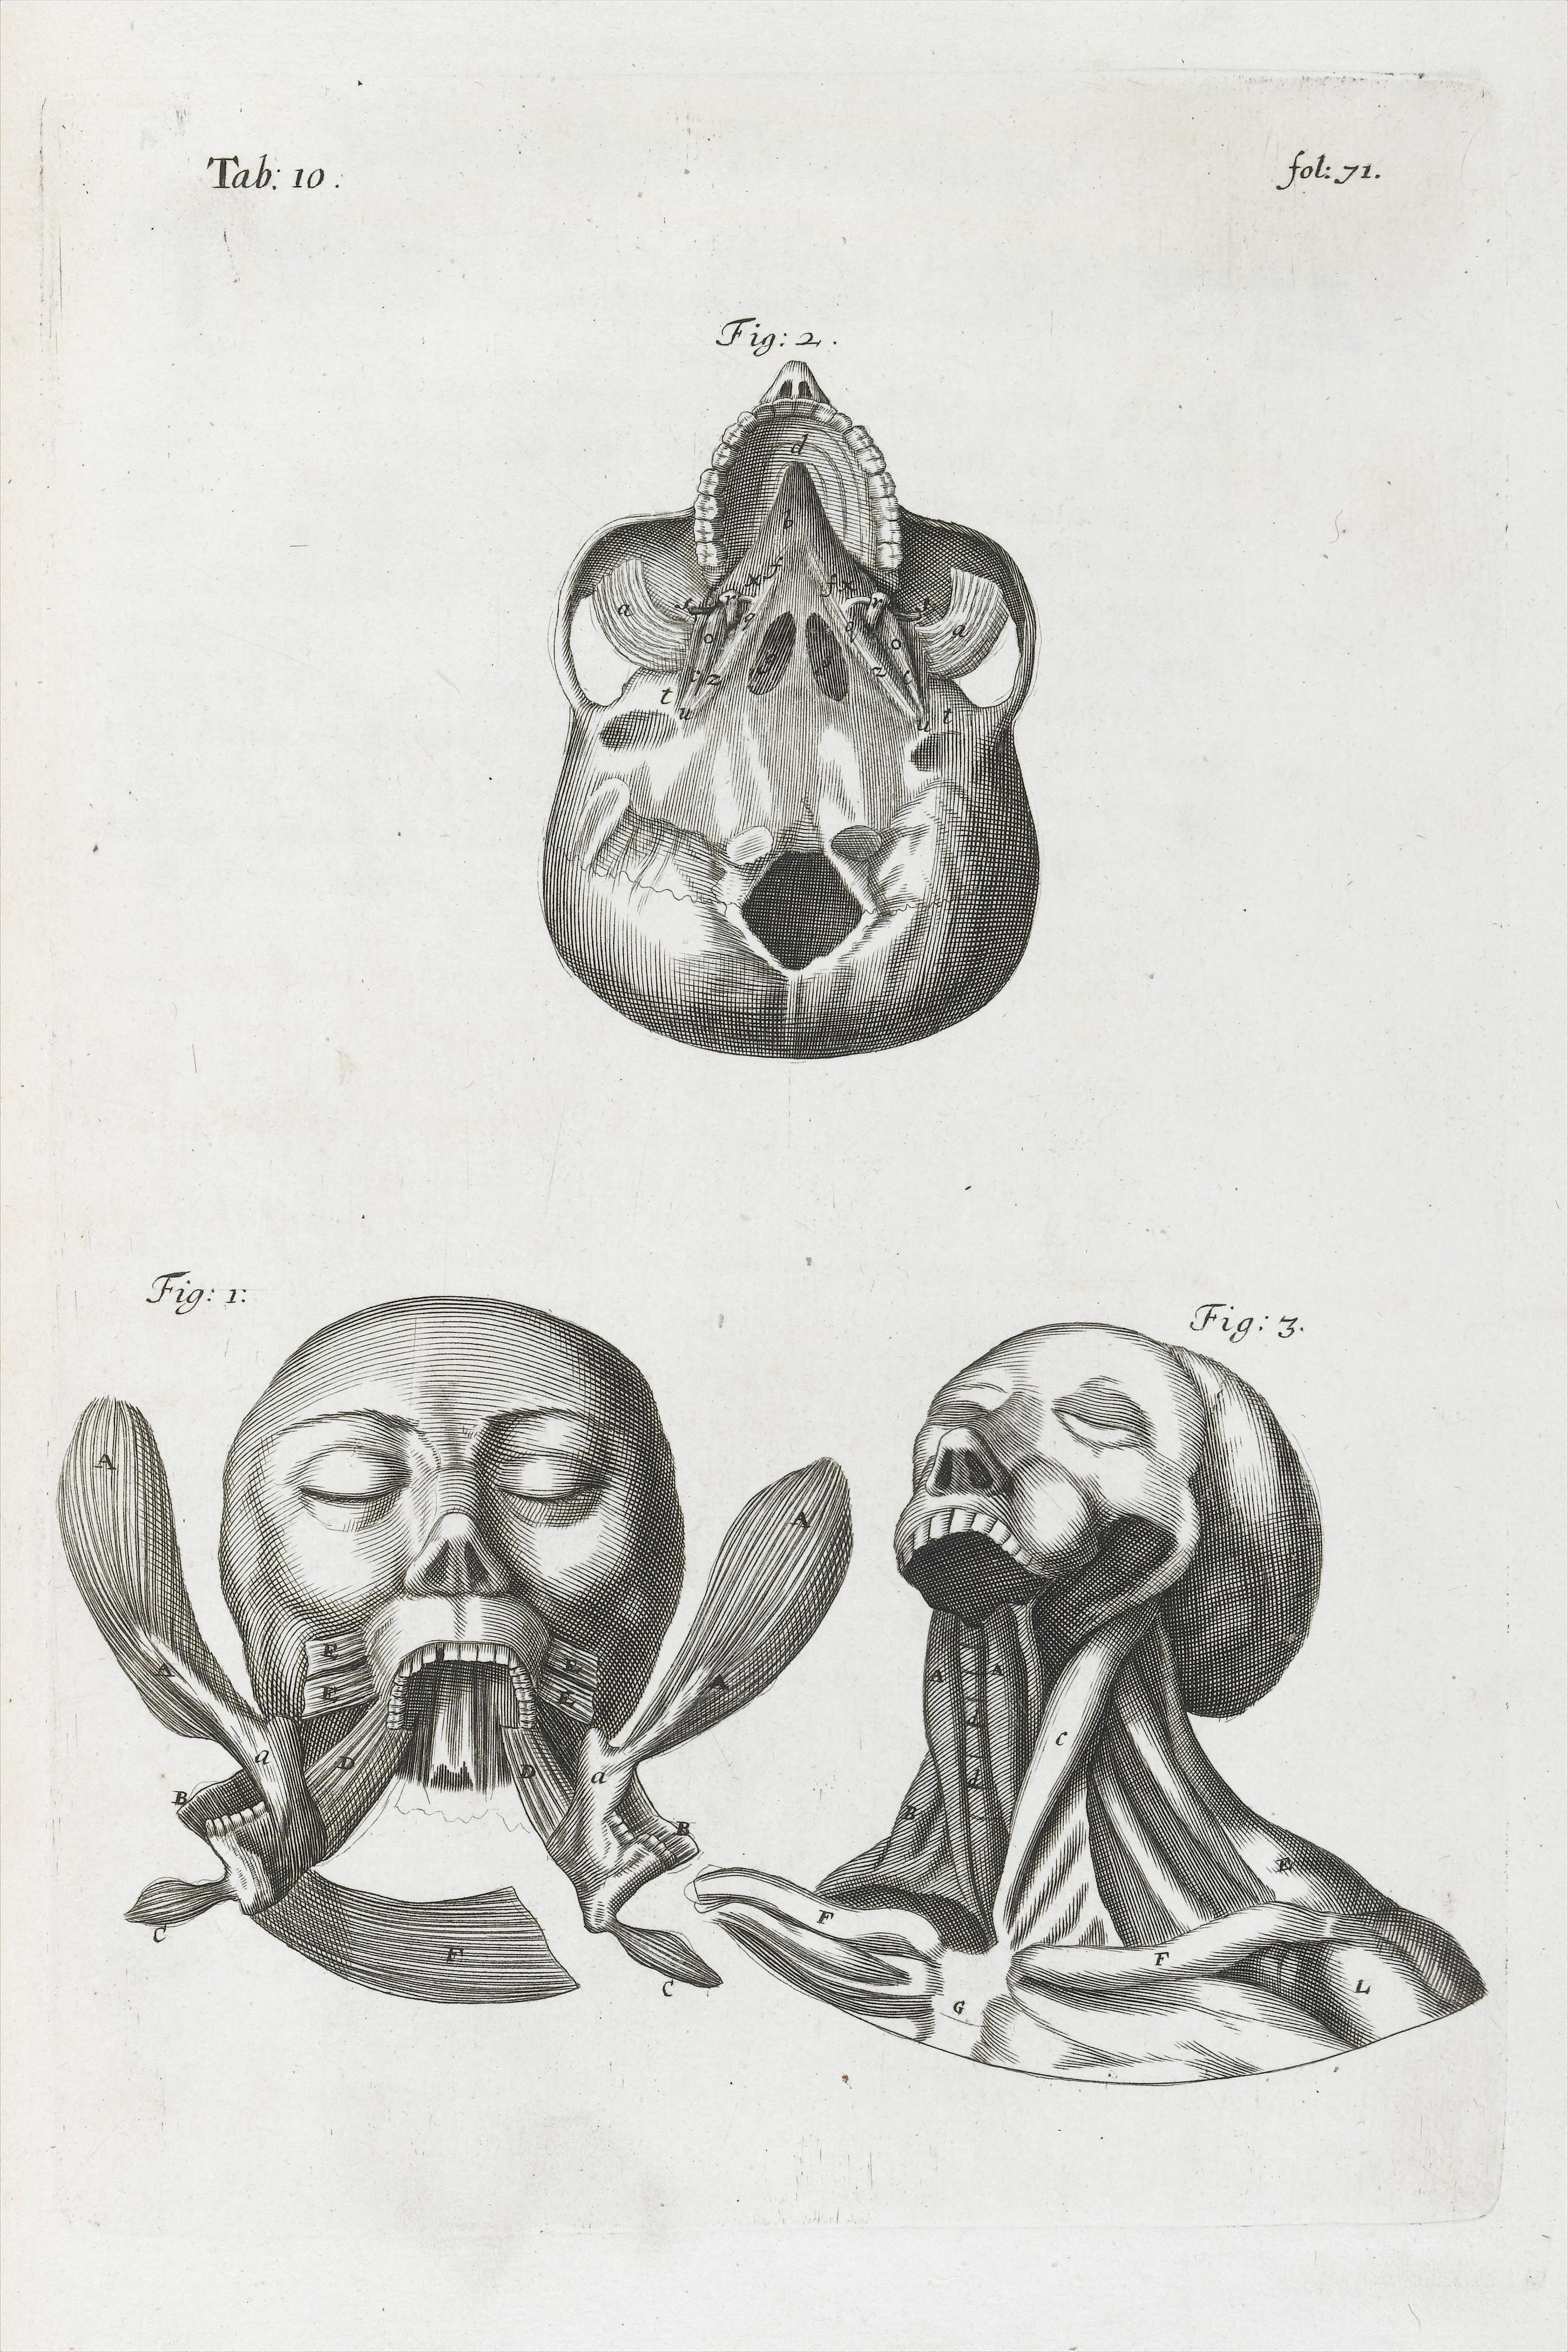 Anatomy of human neck and throat